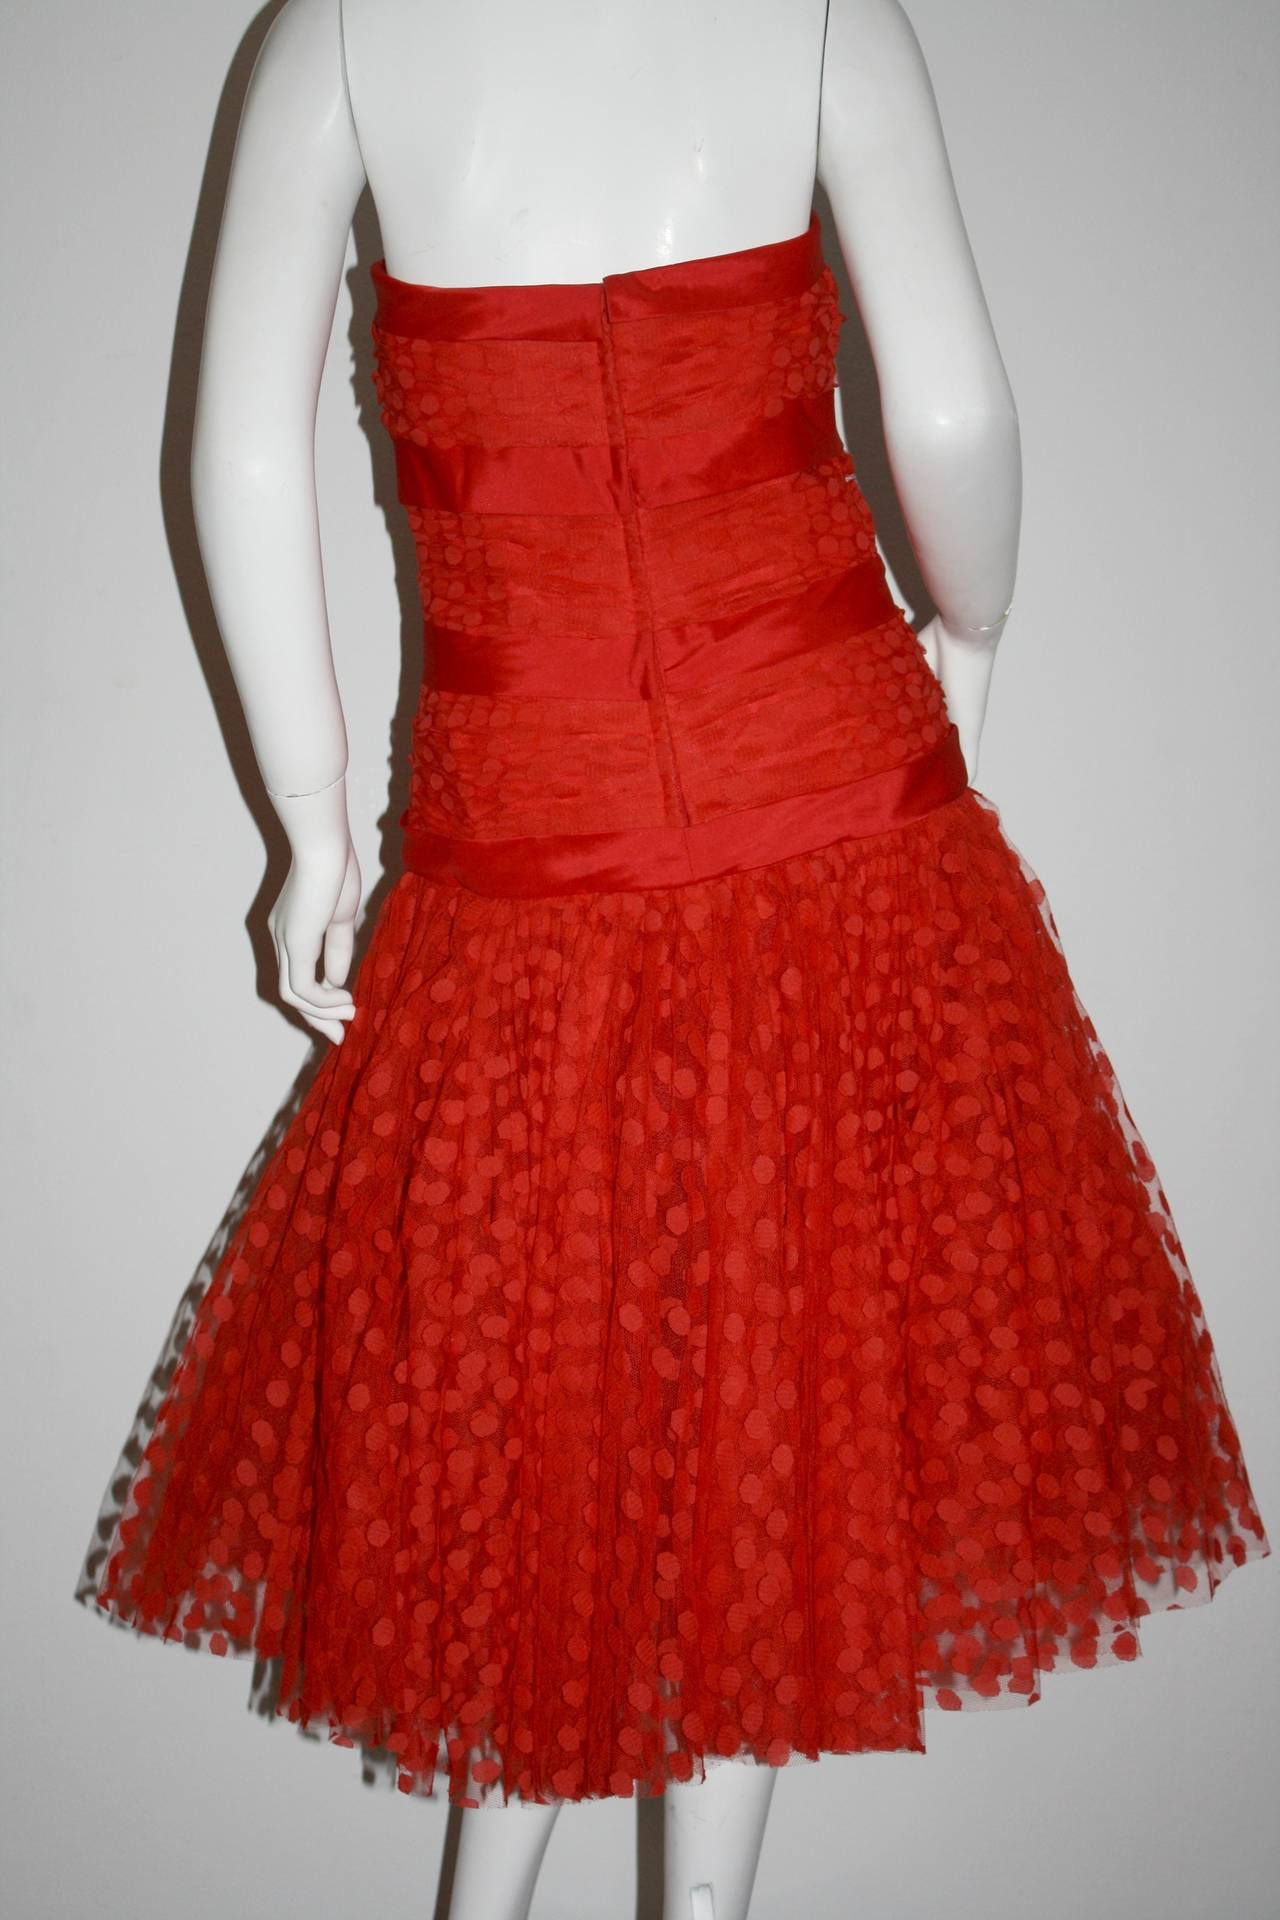 Incredible Vintage Jill Richards for Elizabeth Arden Red Valentine's Day Dress 5